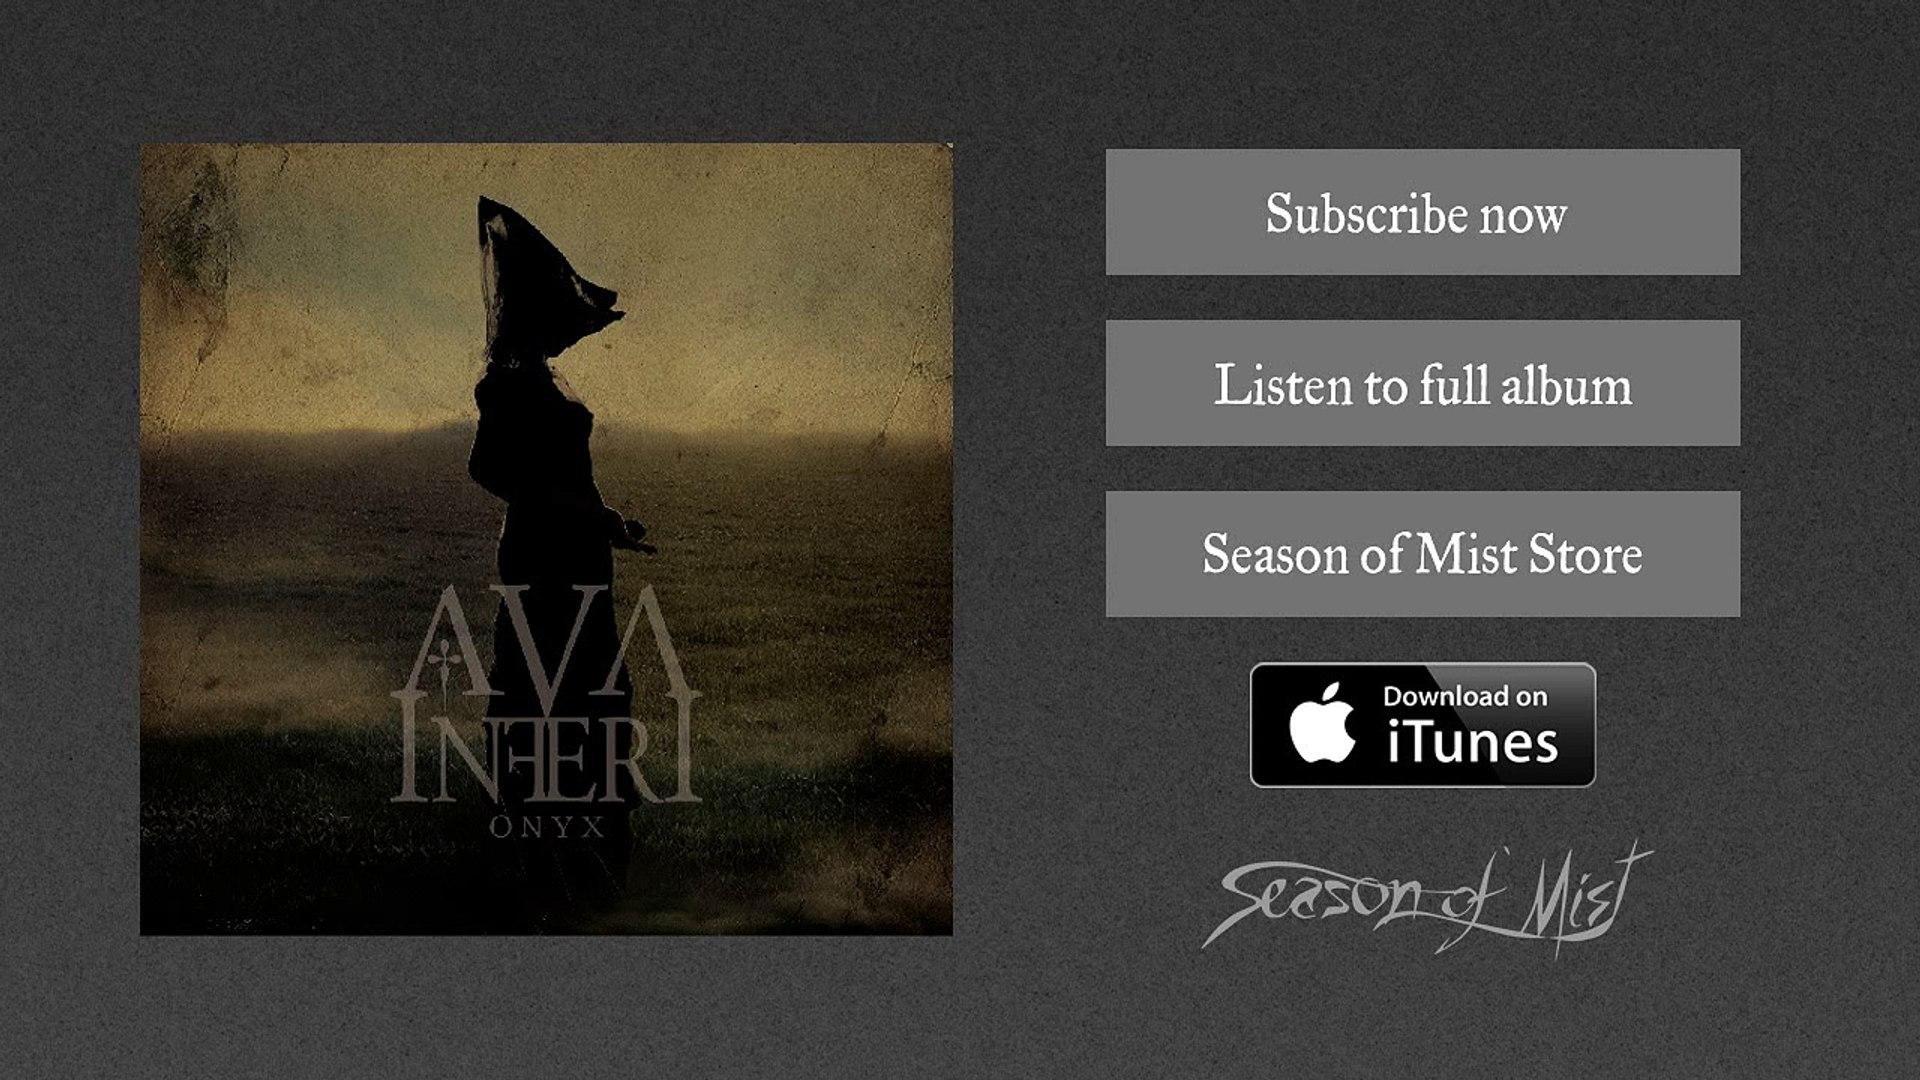 Ava Inferi - Onyx